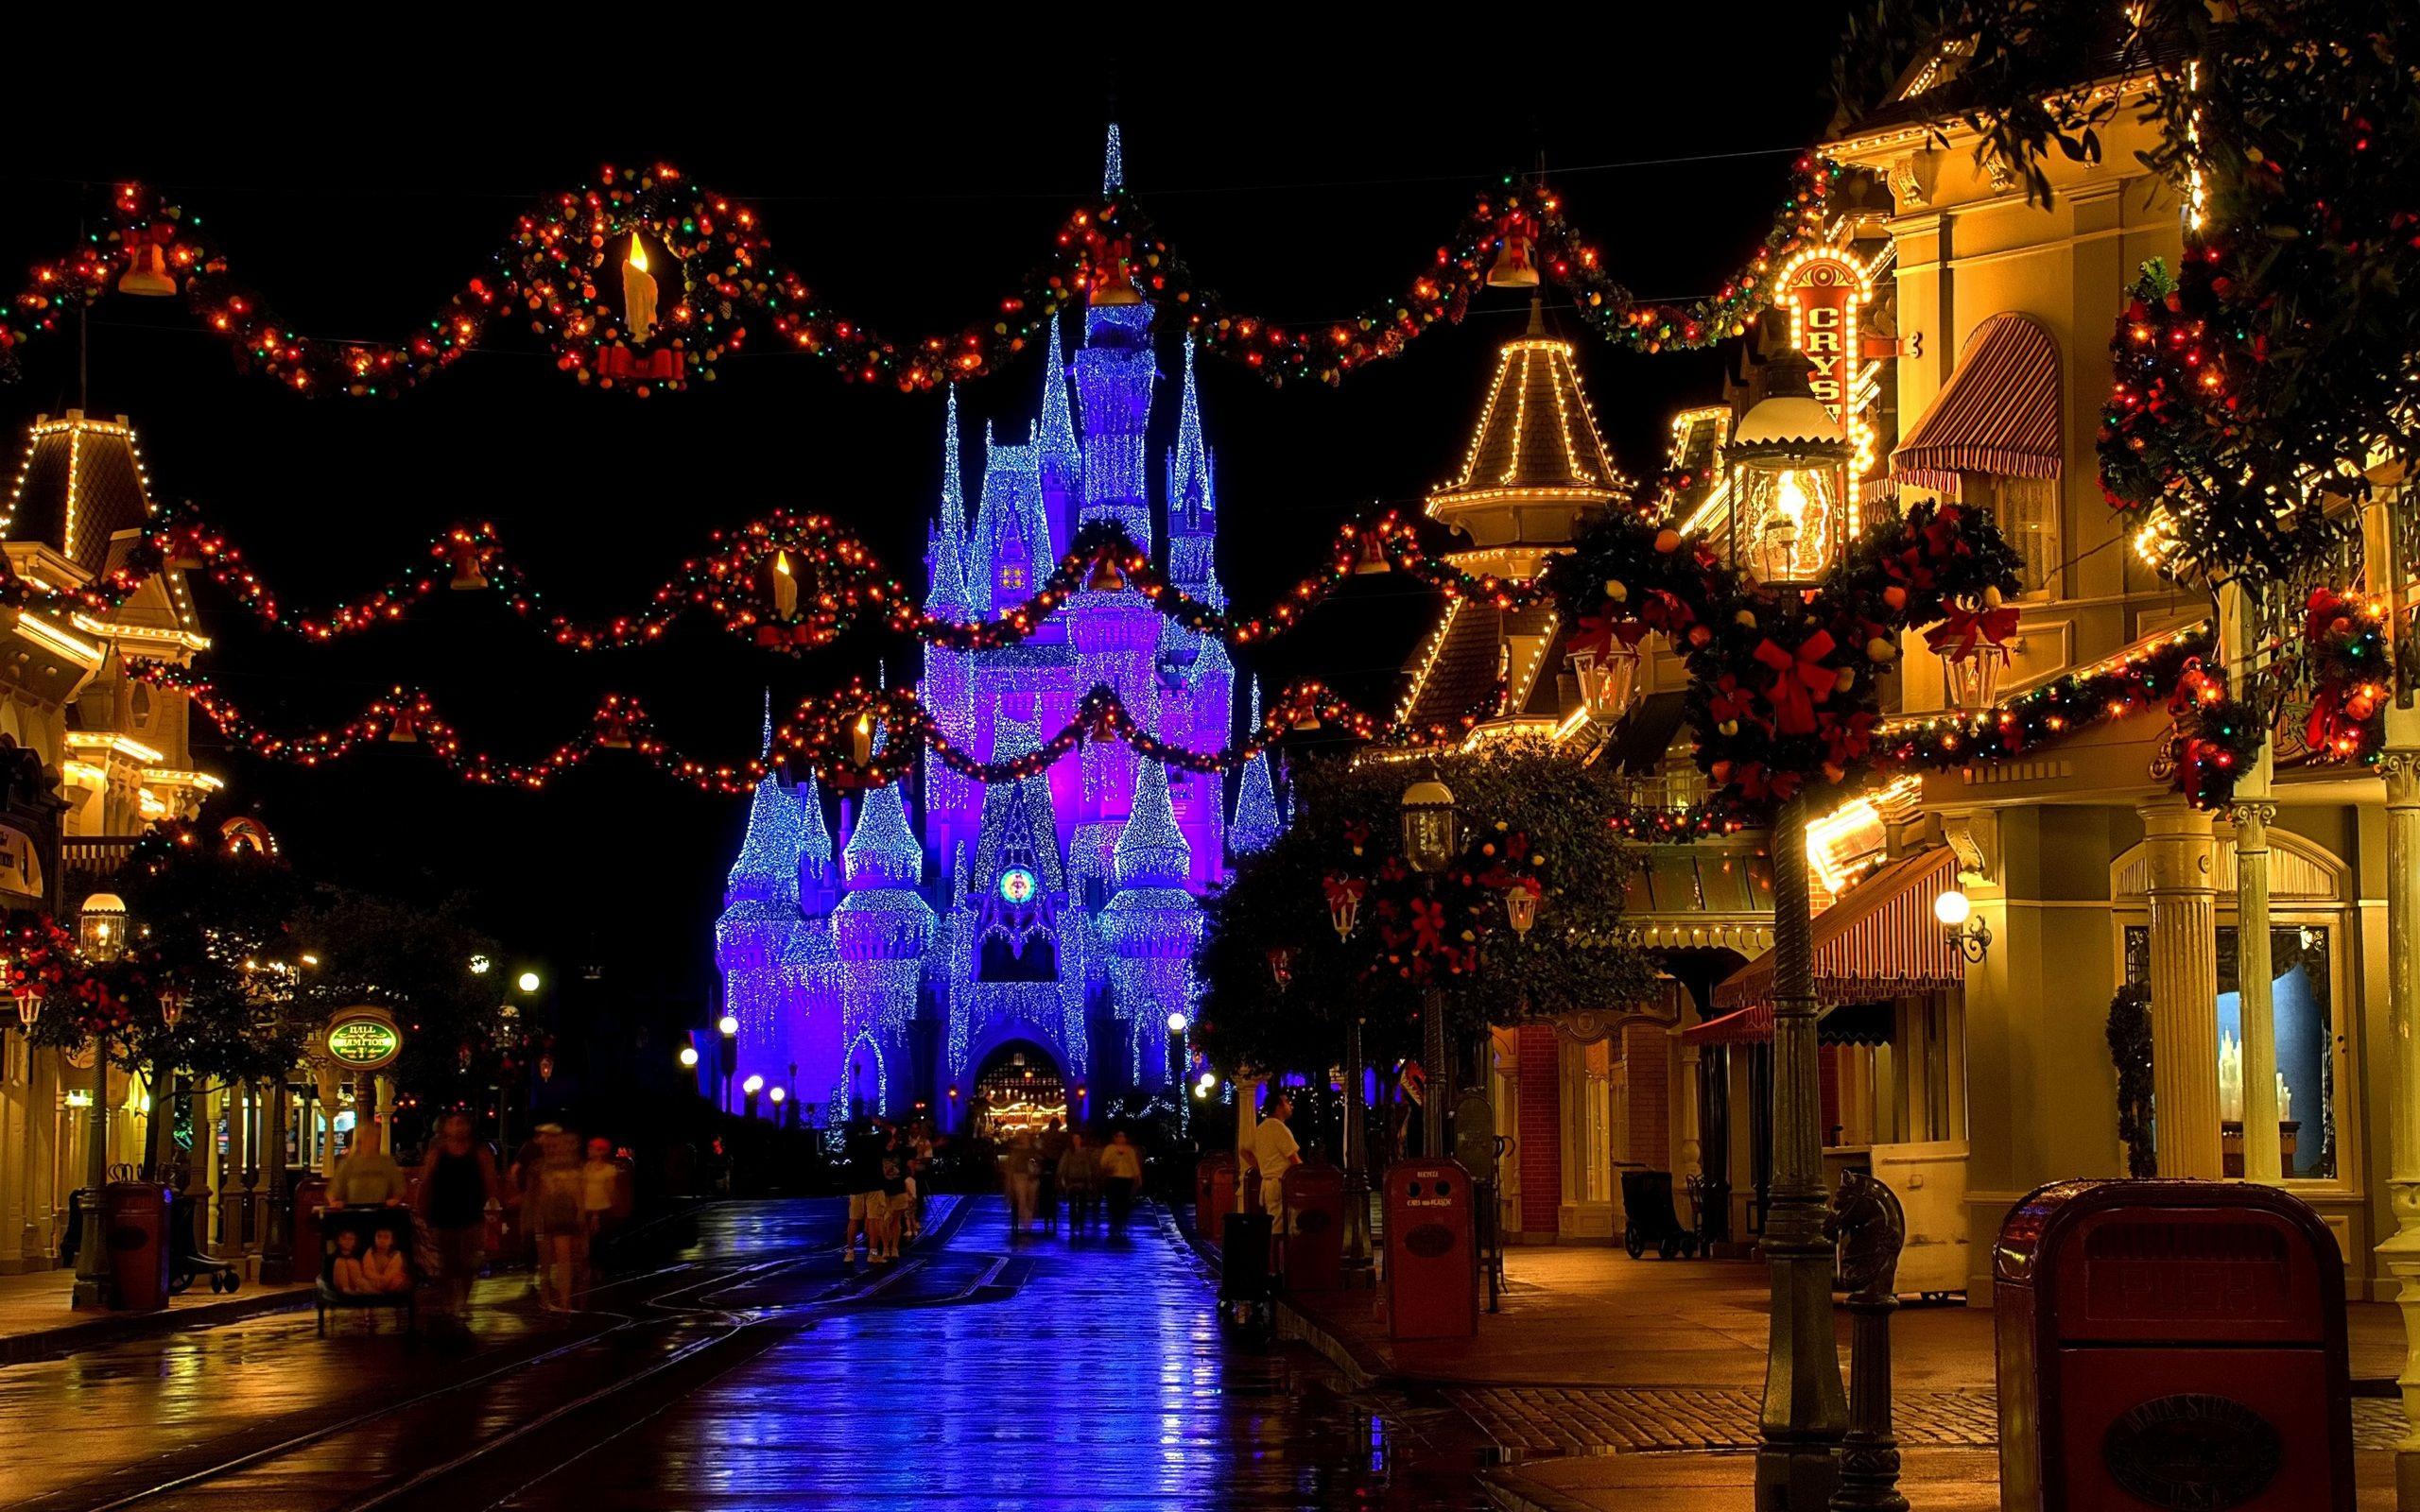 Christmas Computer Wallpapers Desktop Backgrounds 2560x1600 Id 301433 Disney World Christmas Disneyland Christmas Disney Christmas